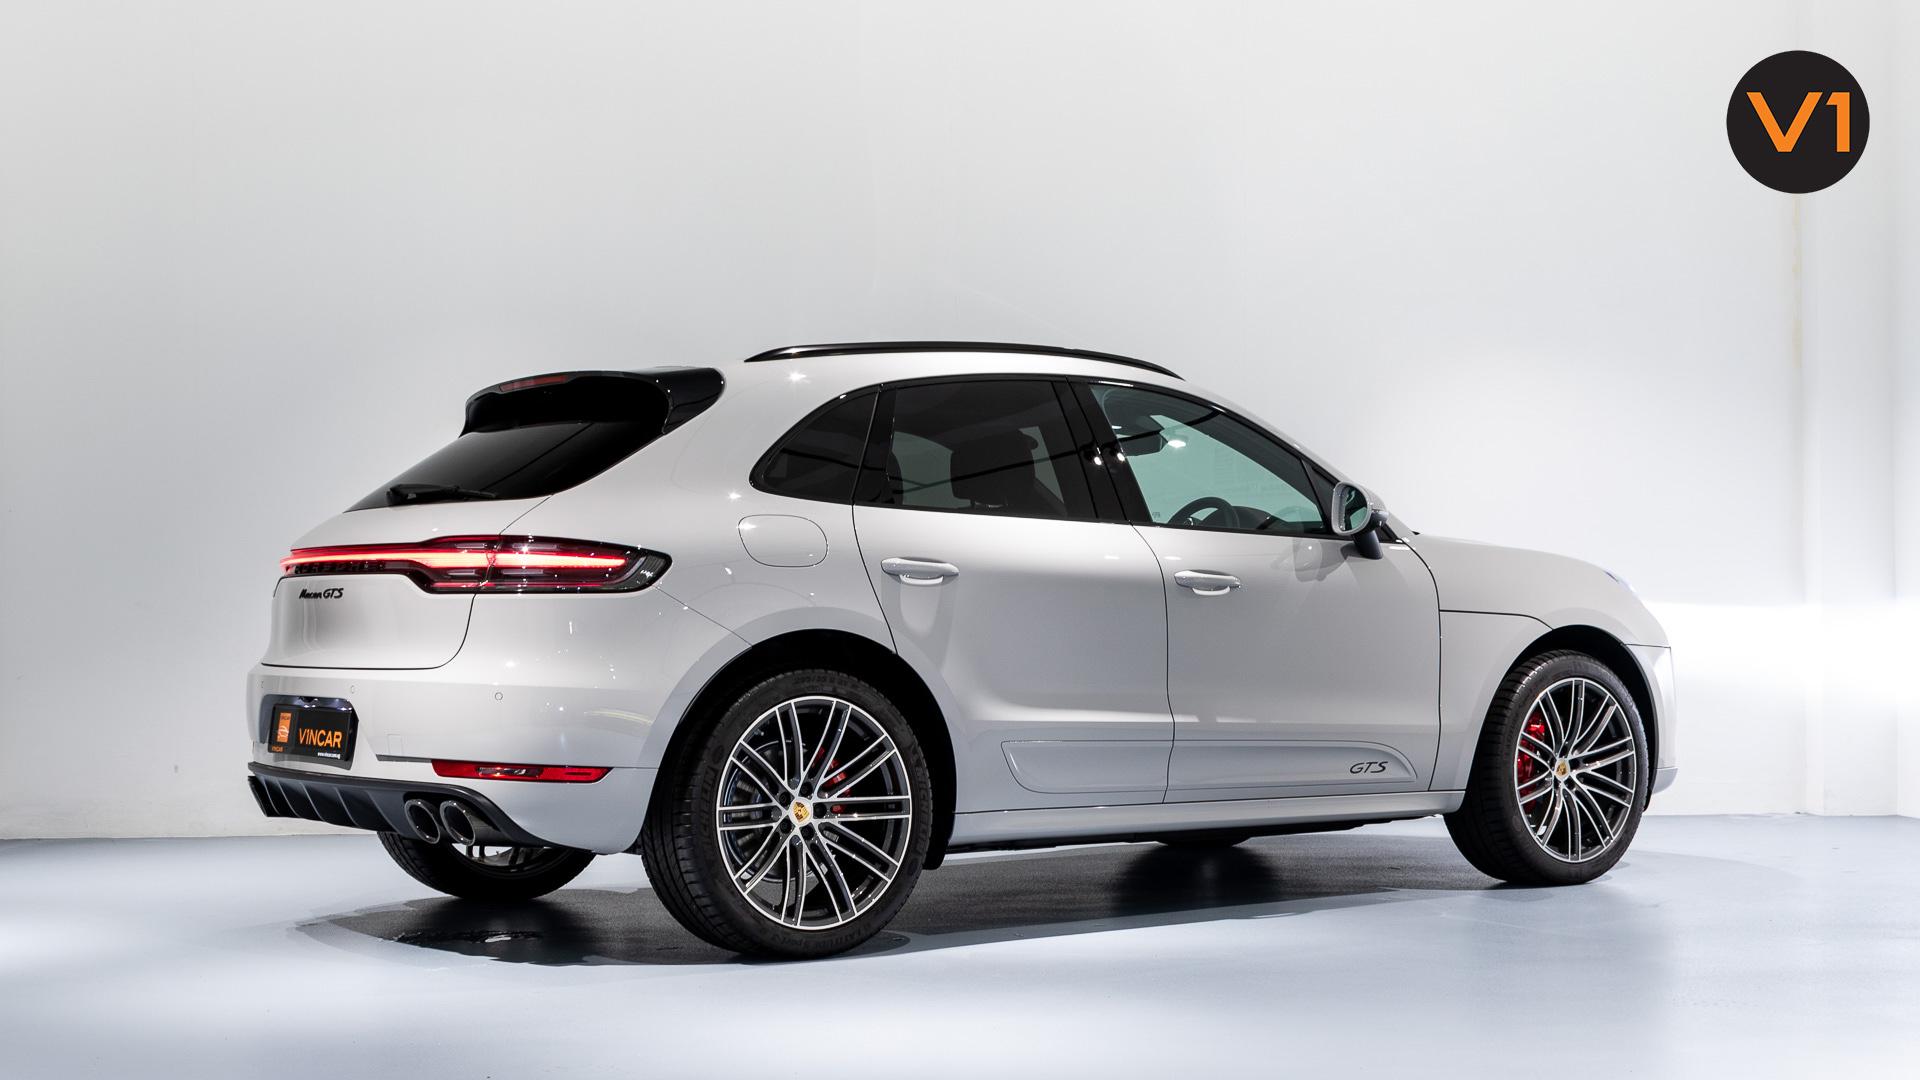 Porsche Macan GTS - Rear Side Profile